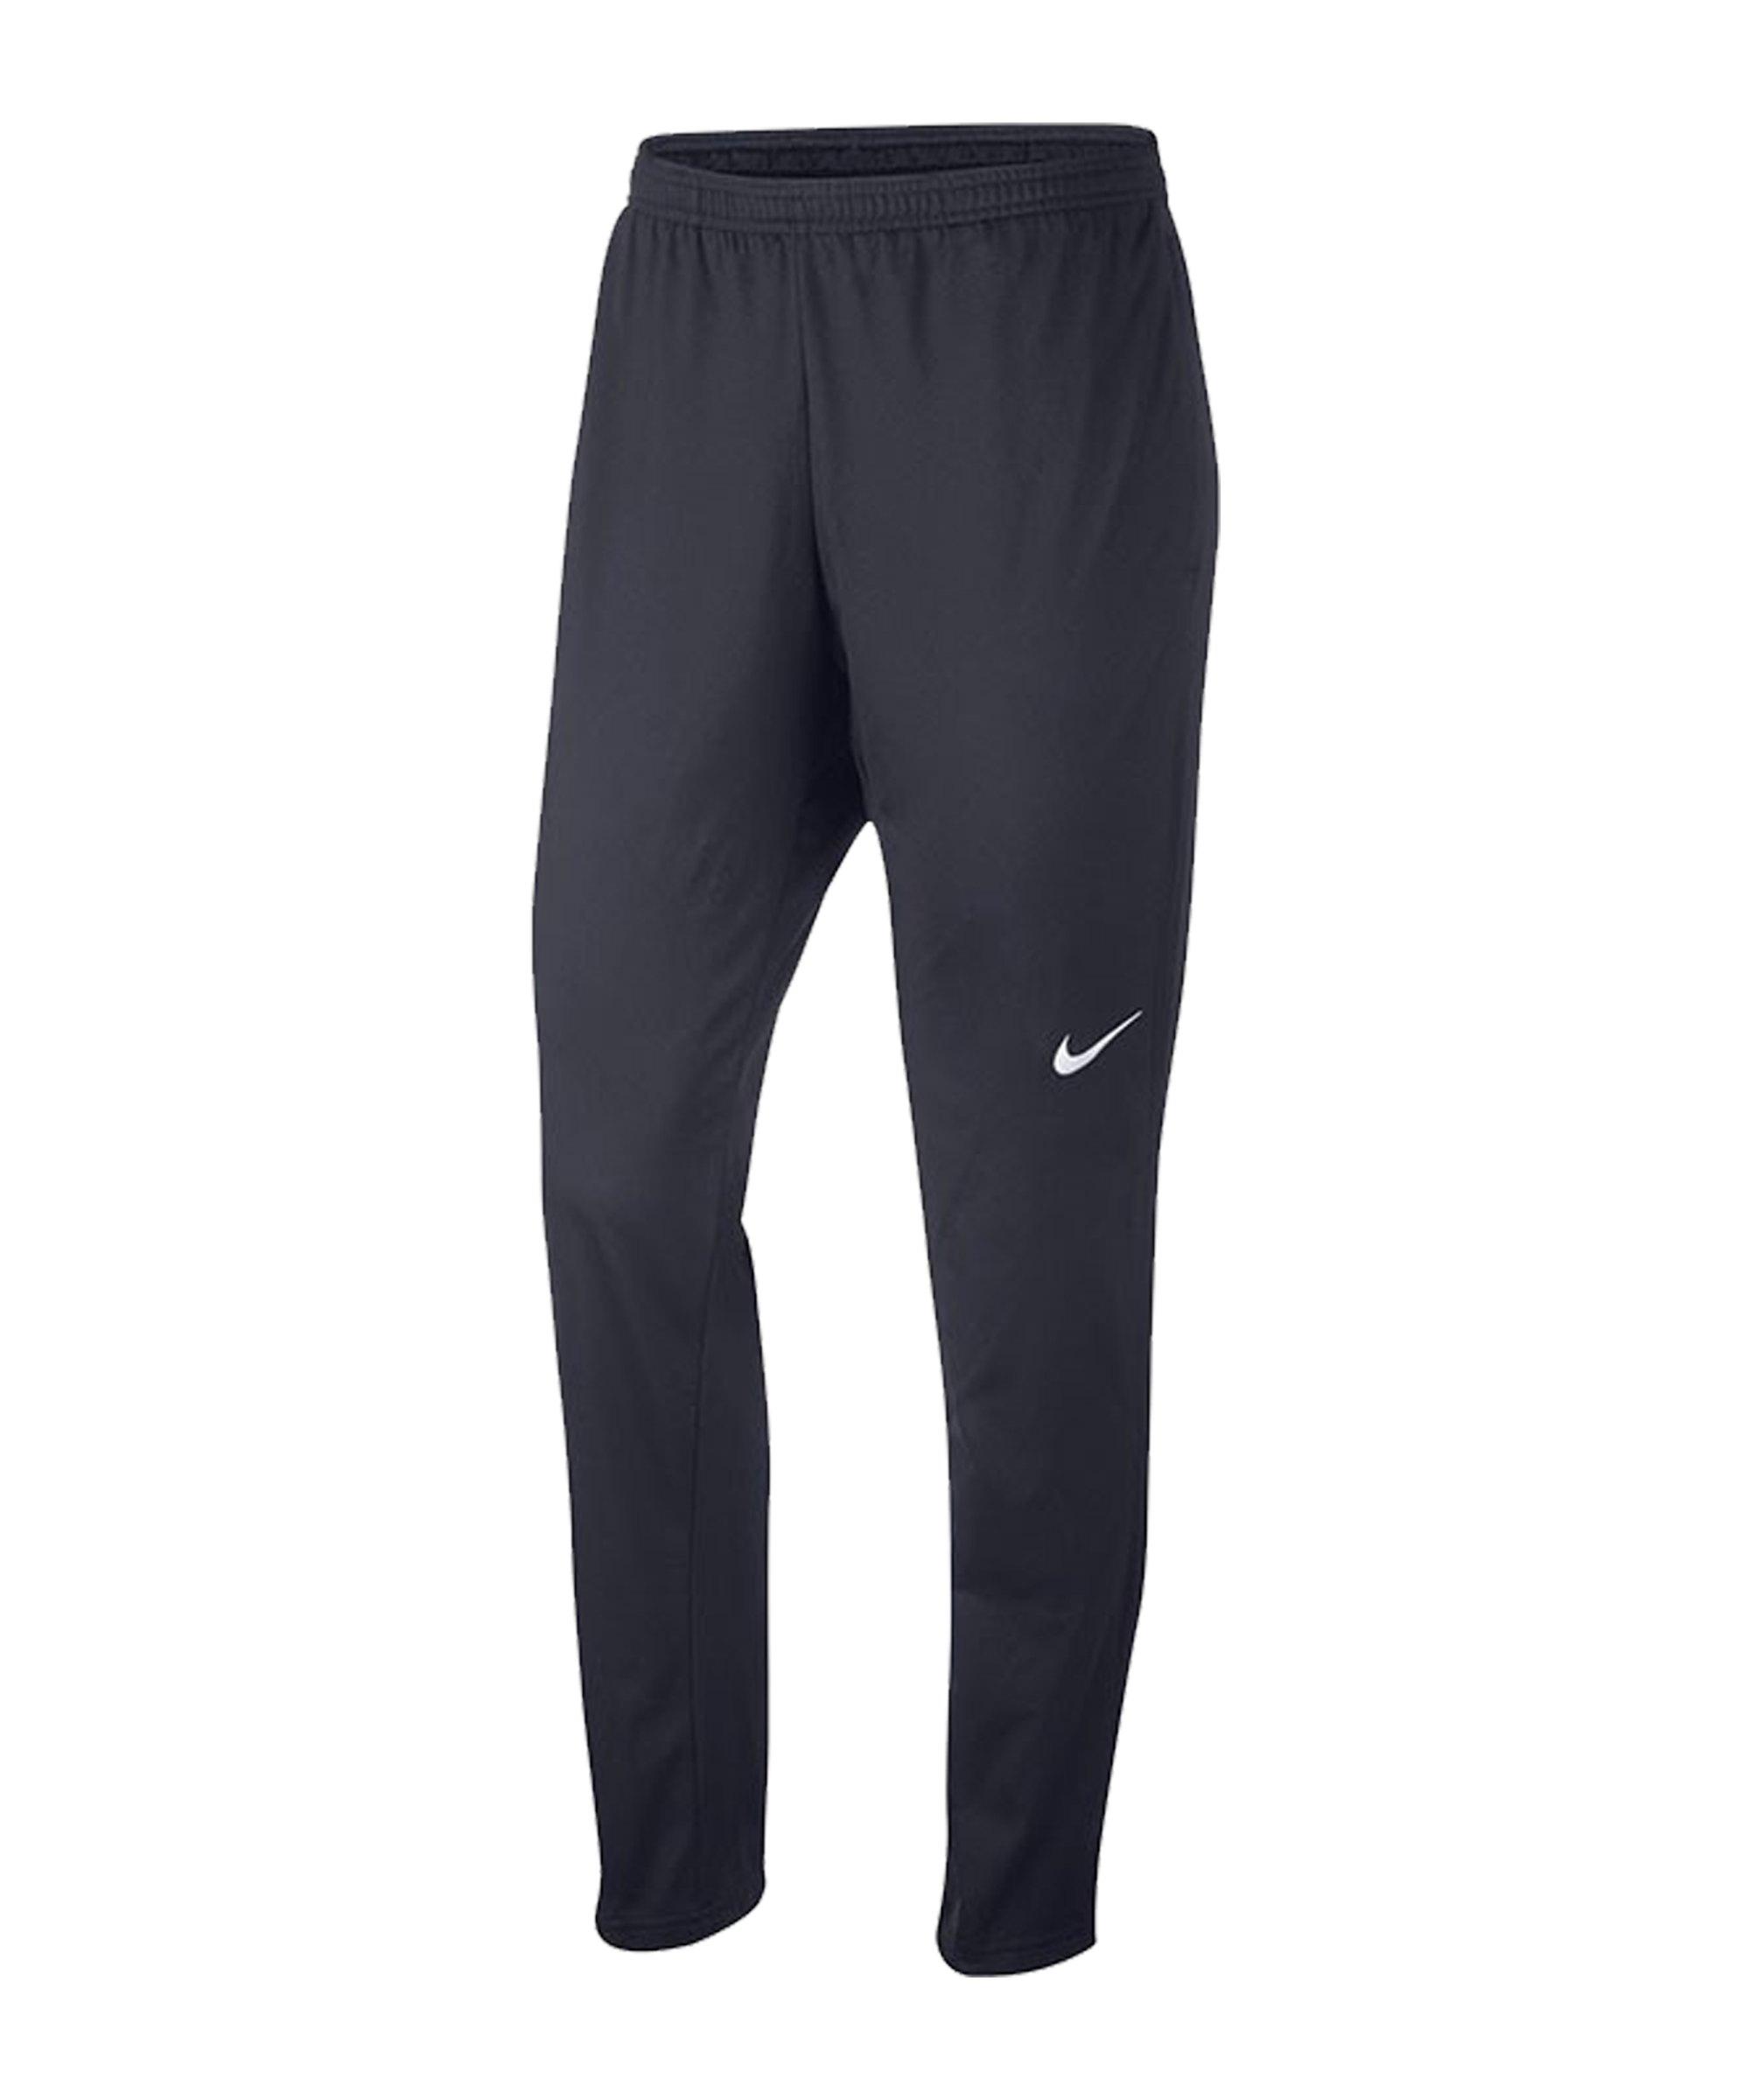 Nike Academy 18 Tech Trainingshose Damen Blau F451